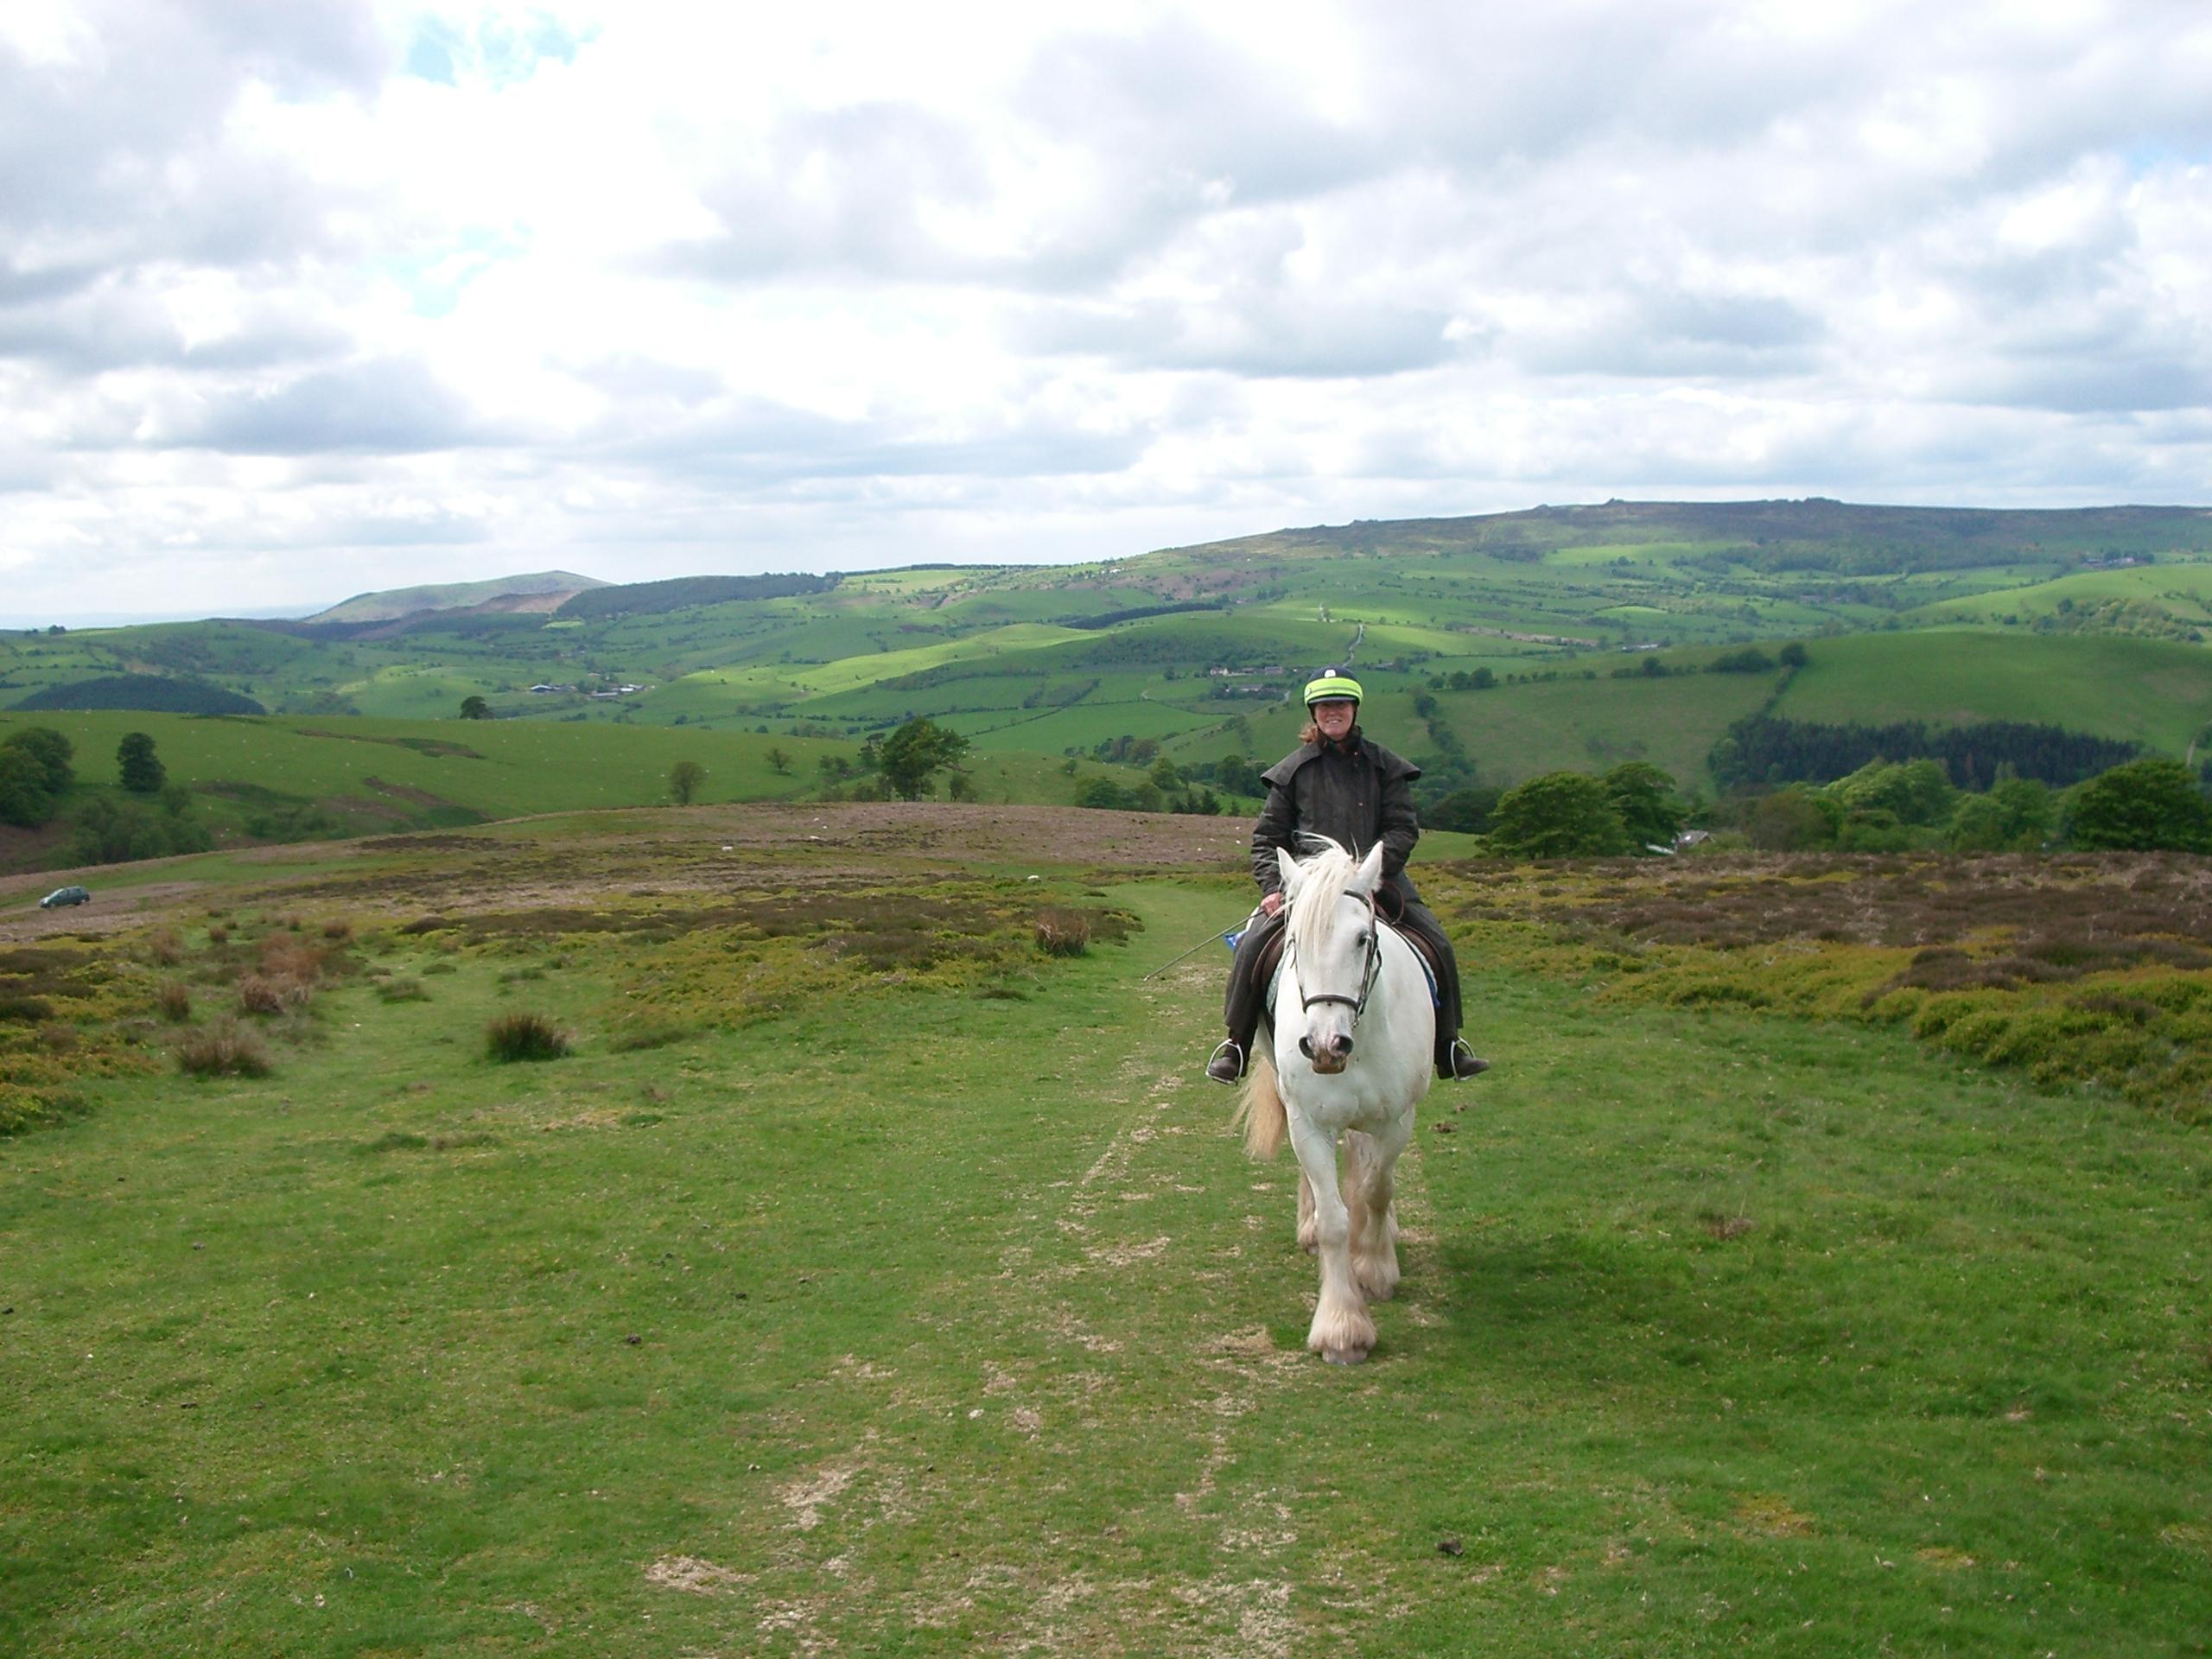 2 horse riders on Mitchels Fold